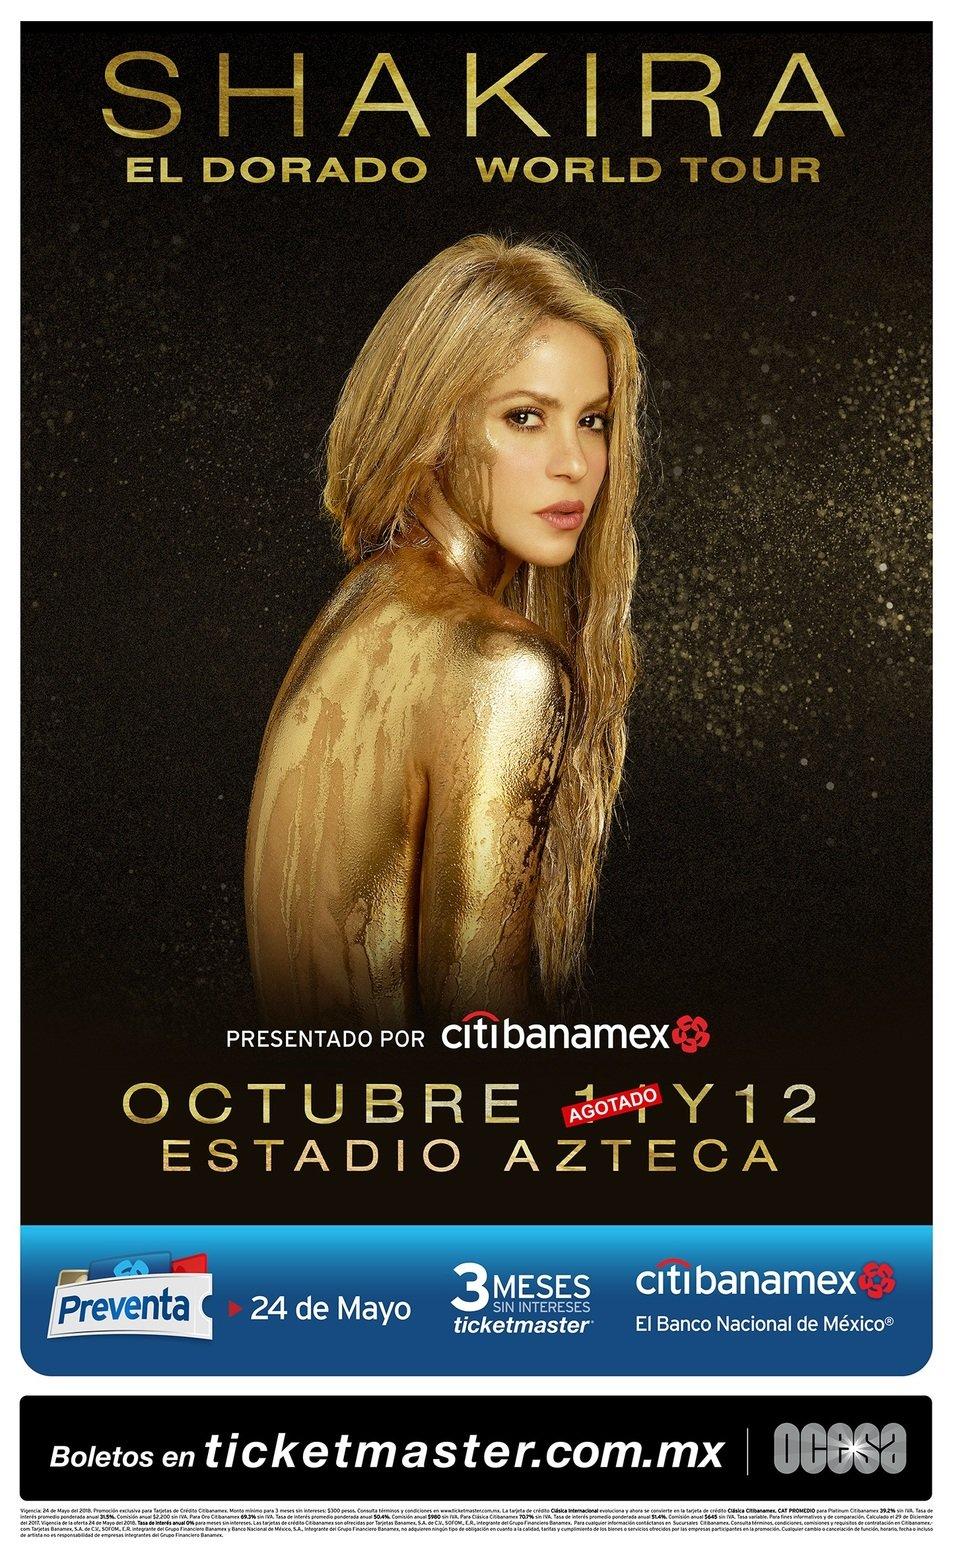 Shakira Estadio Azteca.jpg